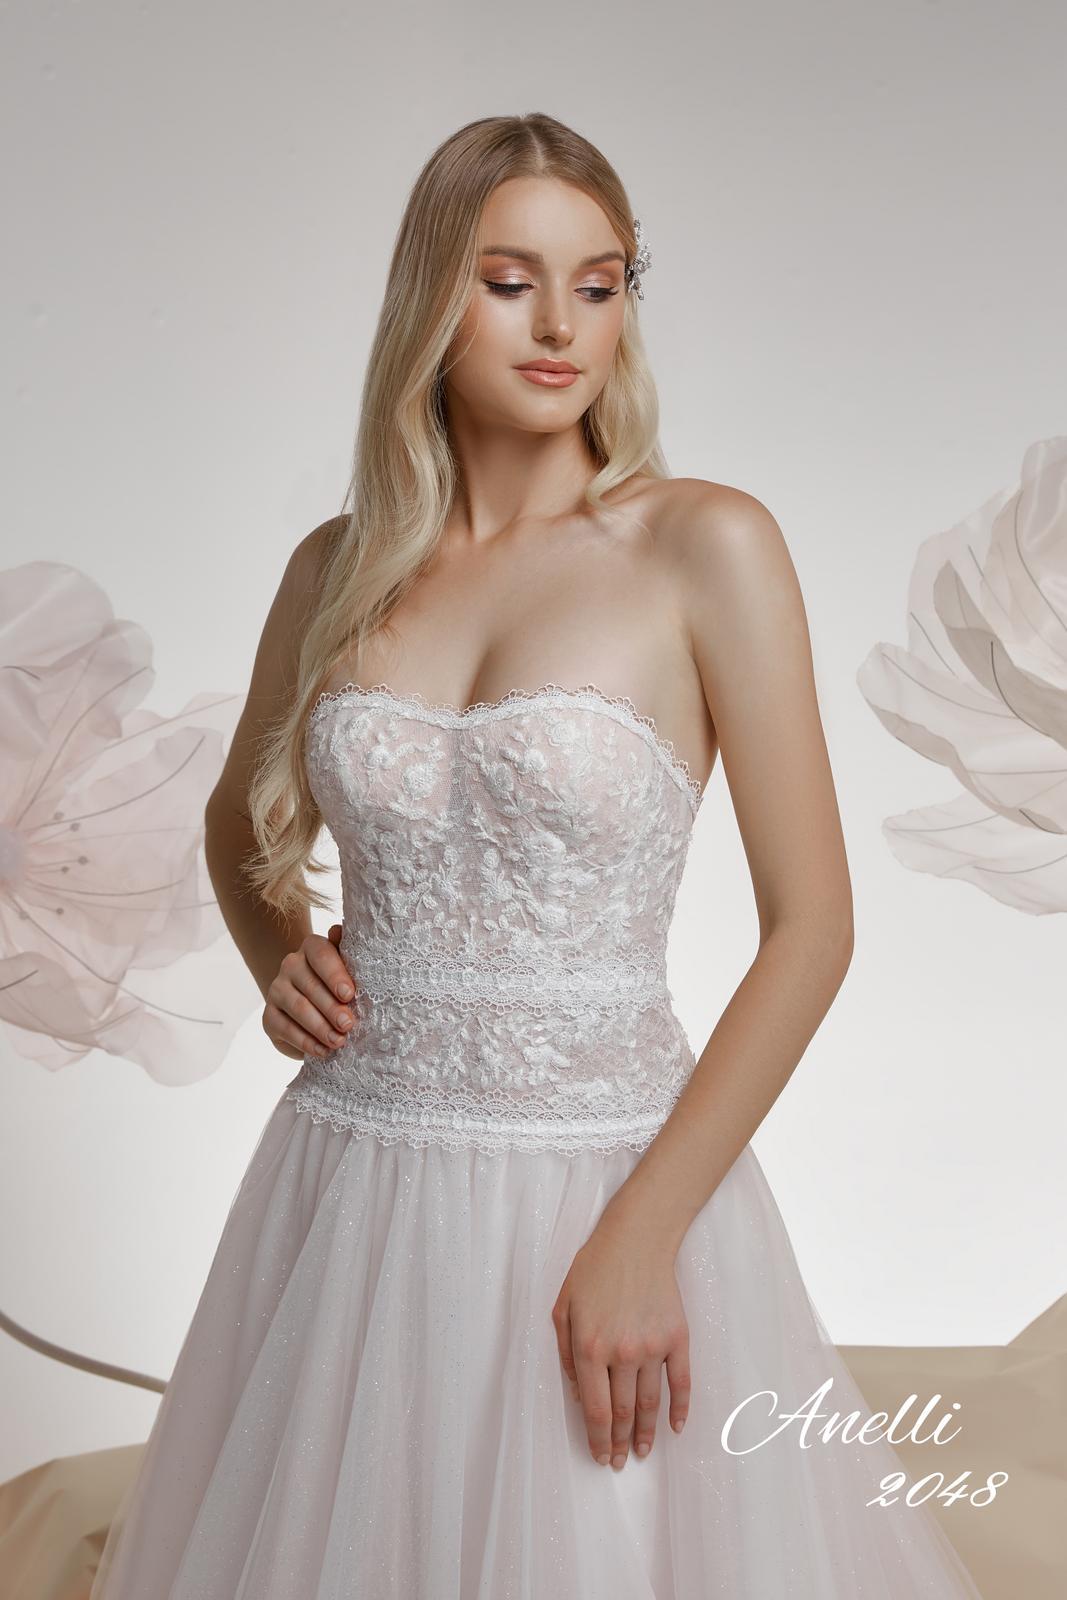 Svadobné šaty - Imagine 2048 - Obrázok č. 2